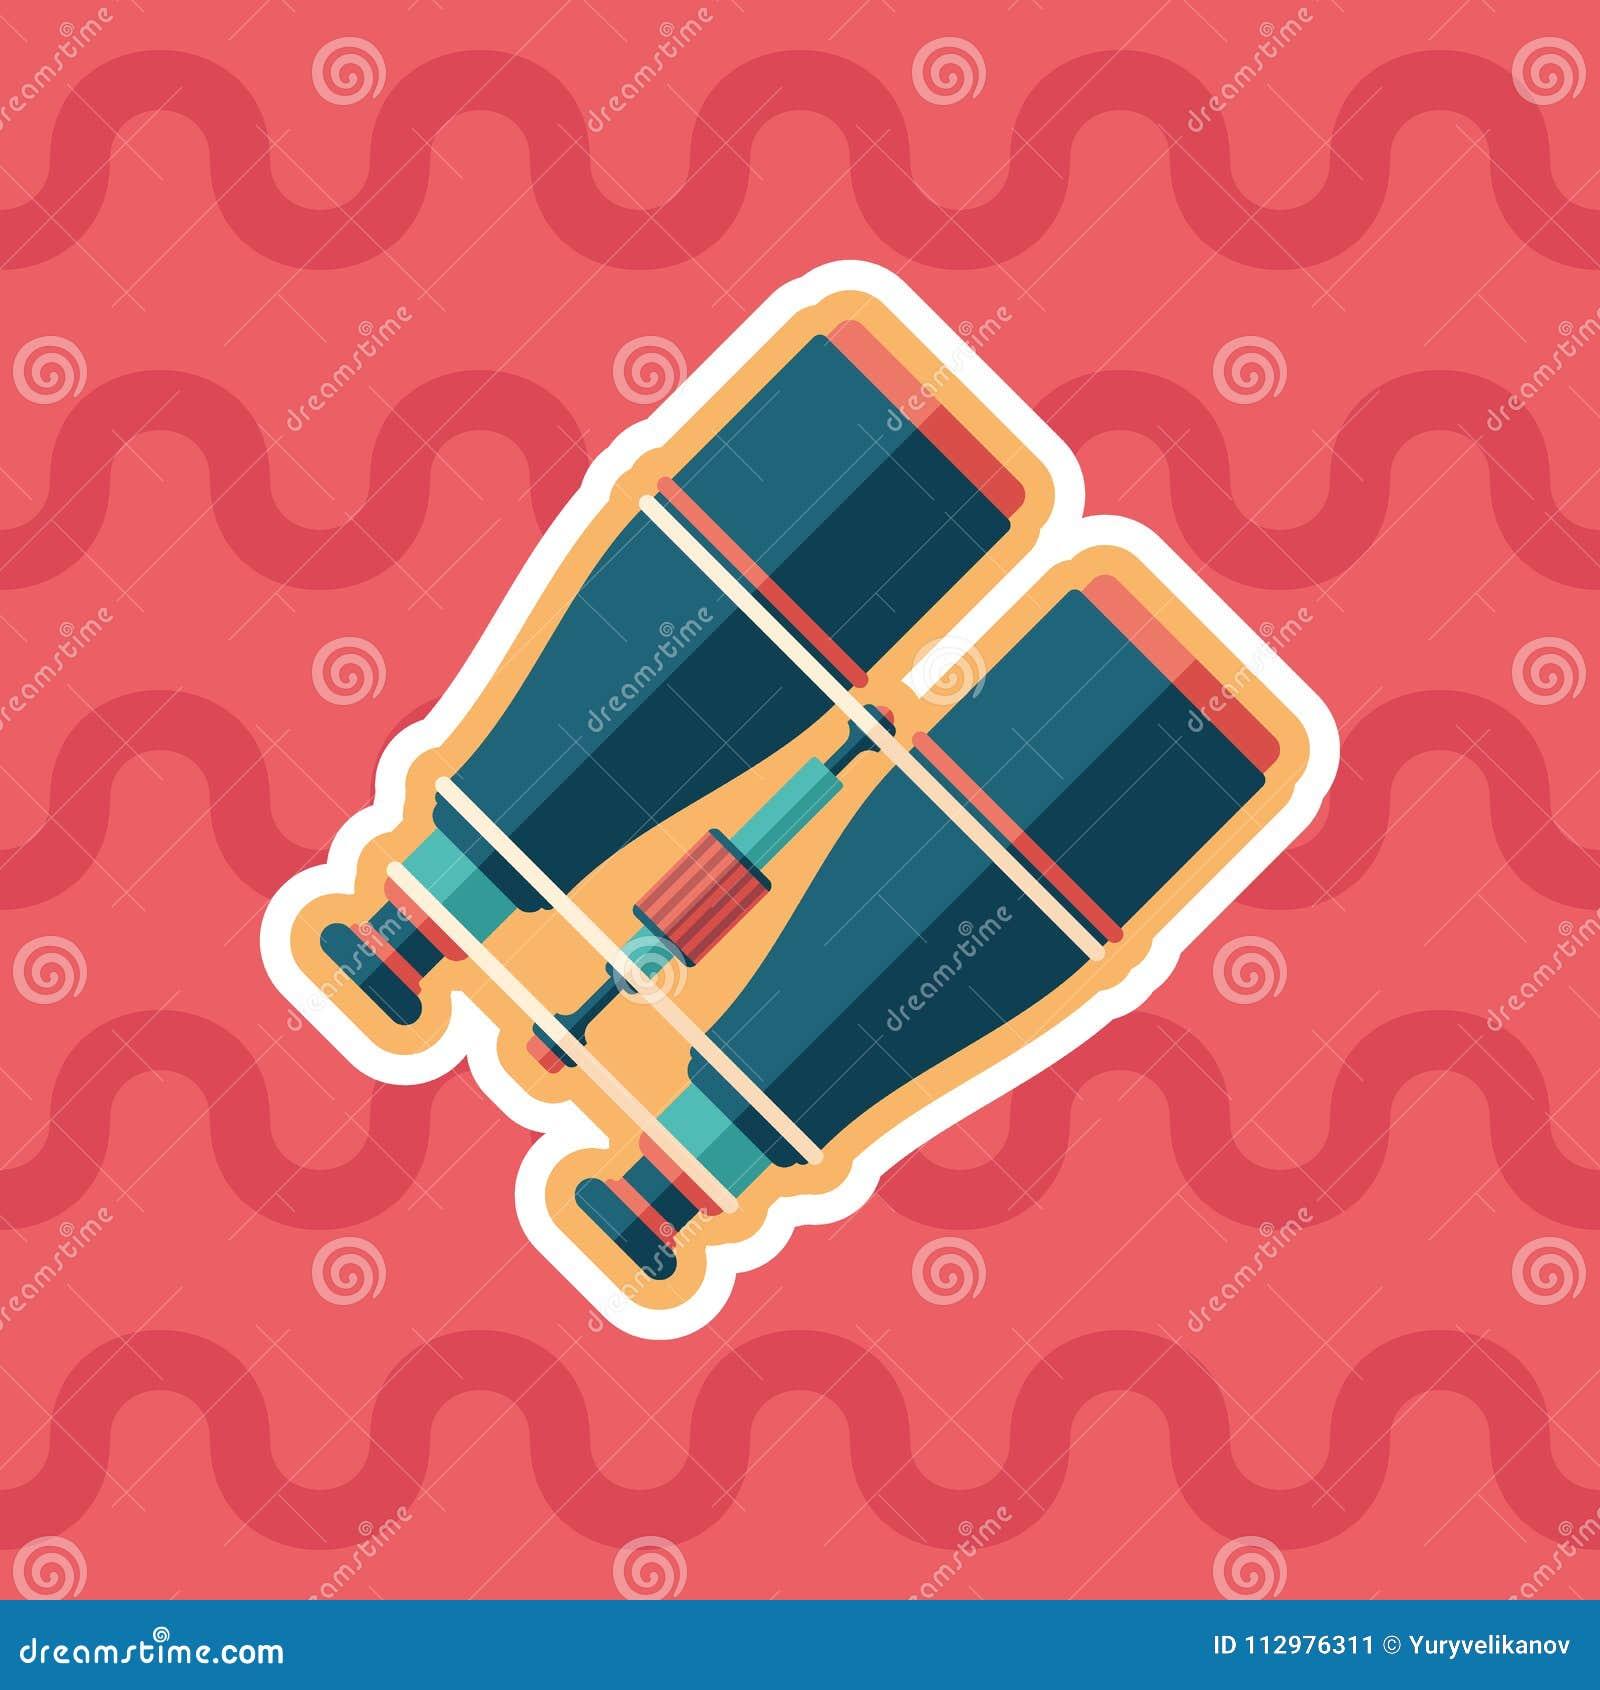 Marine binoculars sticker flat icon with color background.